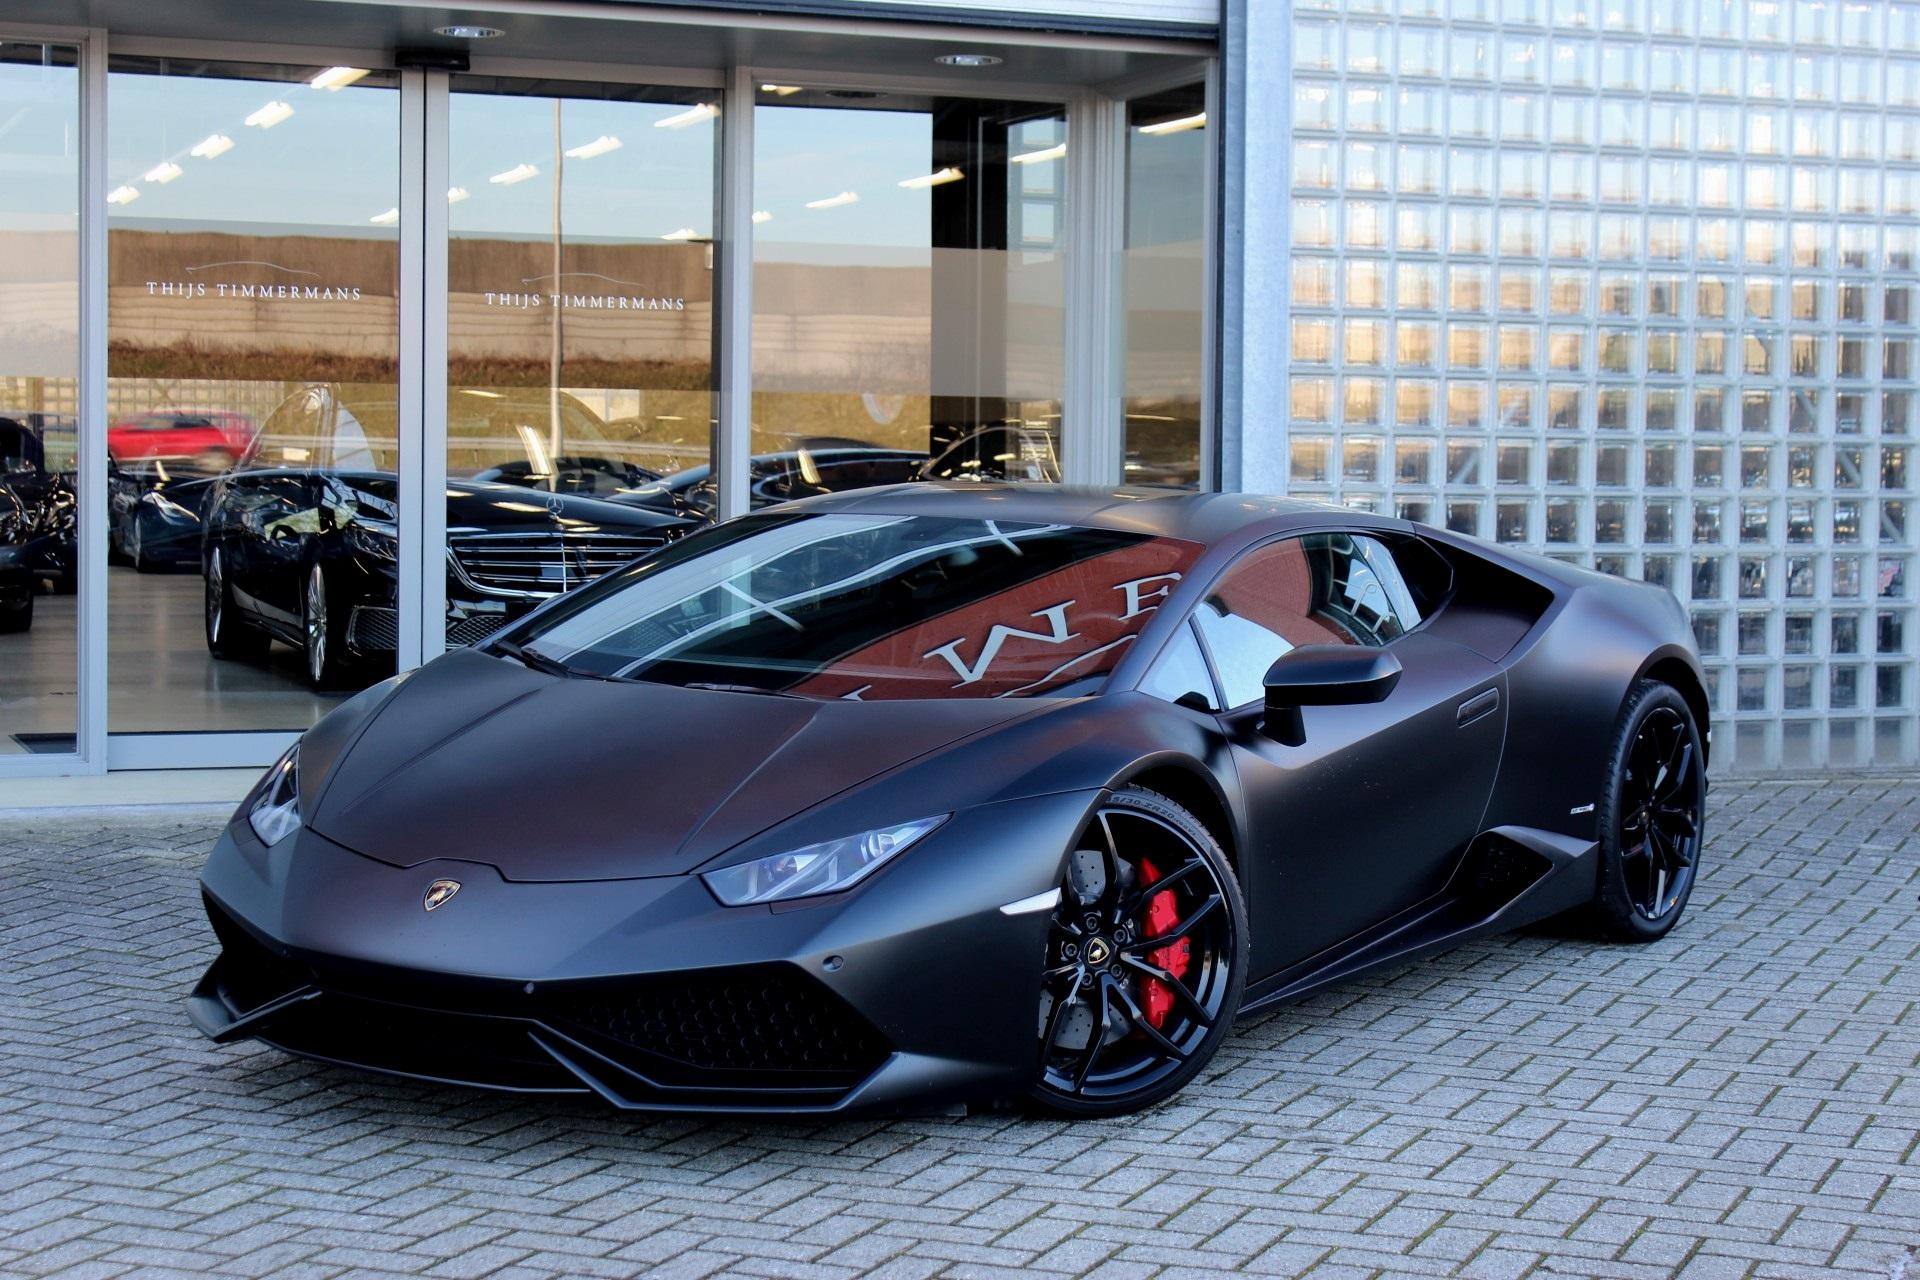 Lamborghini-Huracan-Thijs-Timmermans